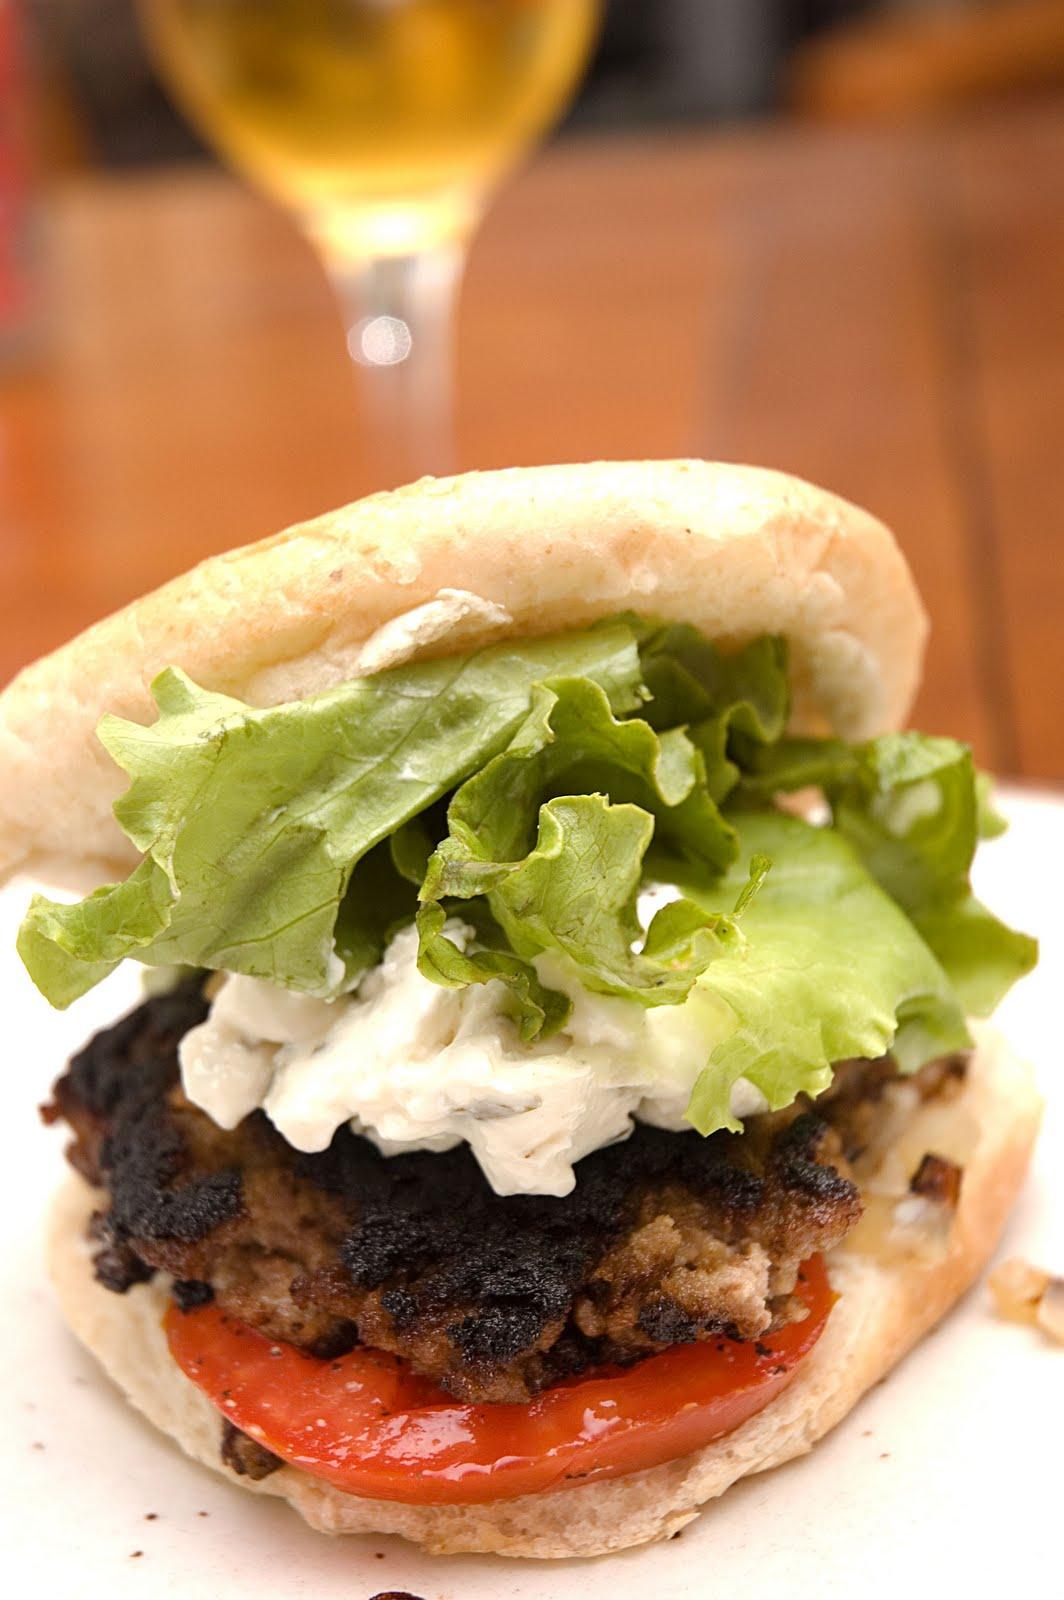 hamburgers la proven ale doumdoum se r gale. Black Bedroom Furniture Sets. Home Design Ideas